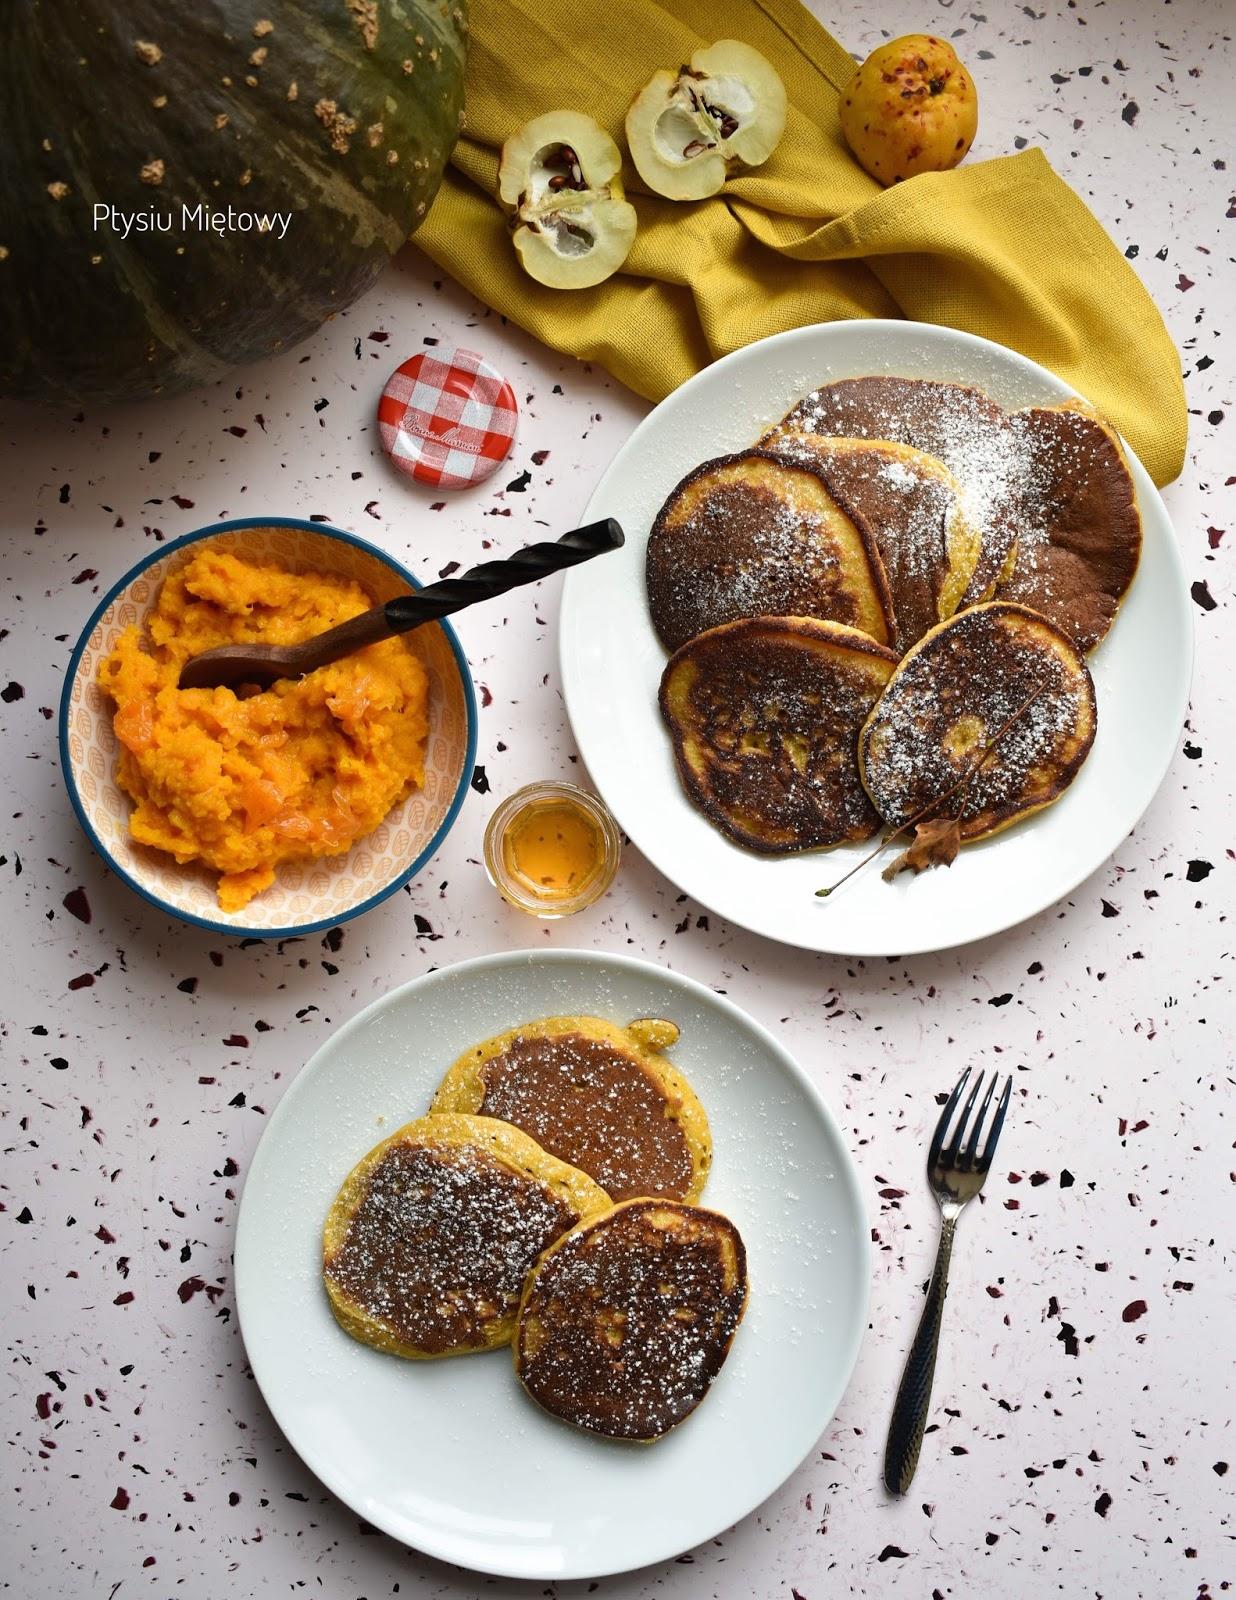 sniadanie, placki, otysiu mietowy, dynia